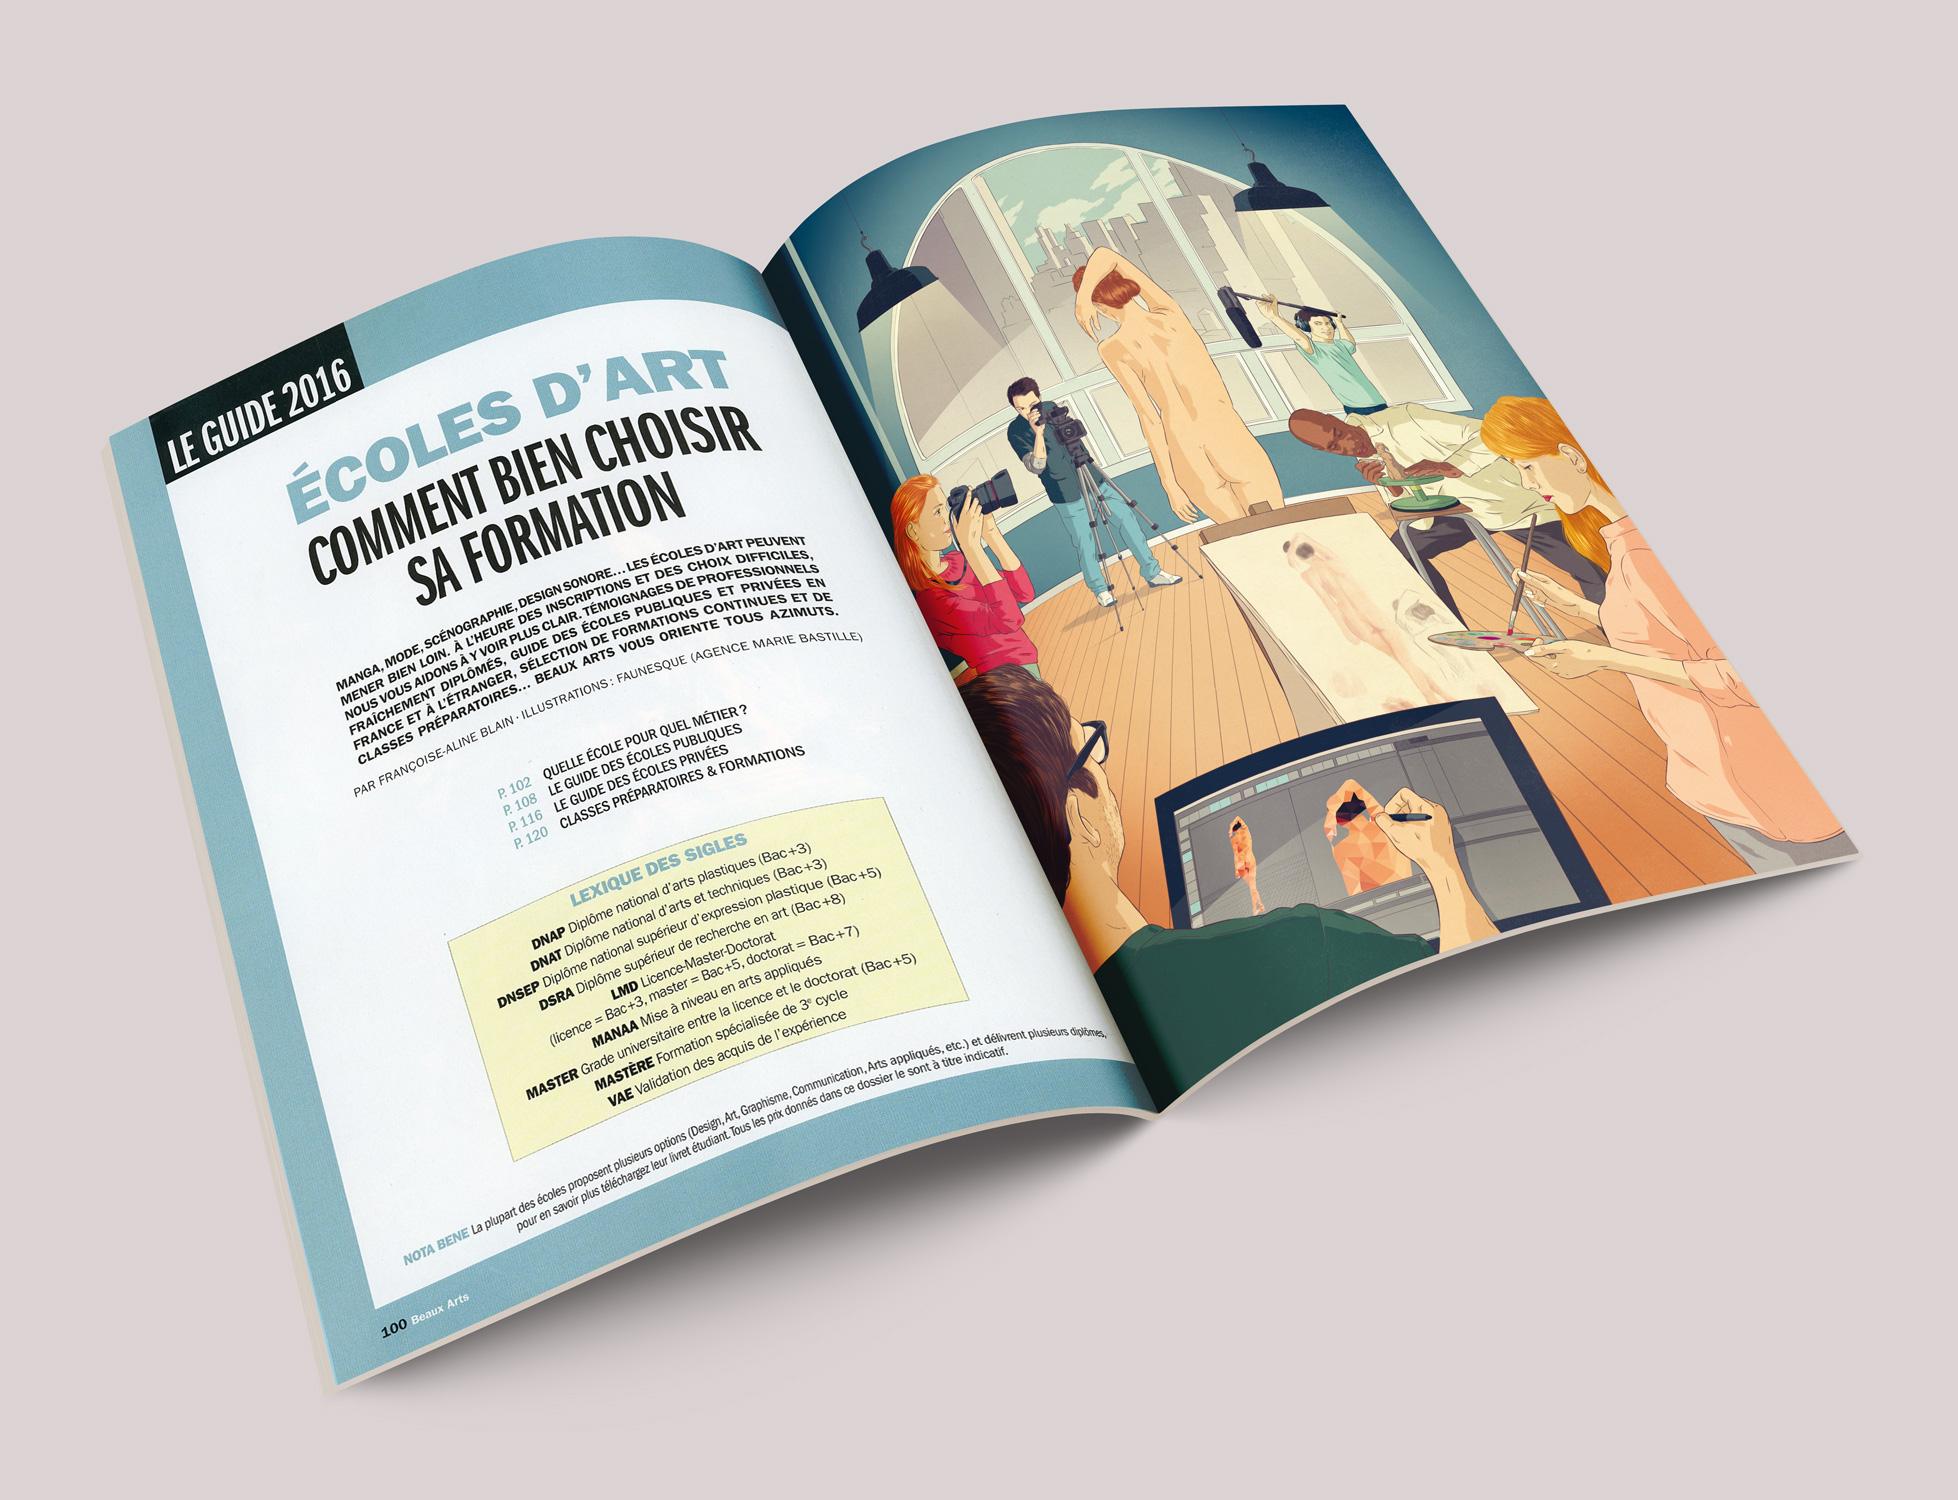 faunesque beaux art magazine agence marie bastillemarie bastille. Black Bedroom Furniture Sets. Home Design Ideas